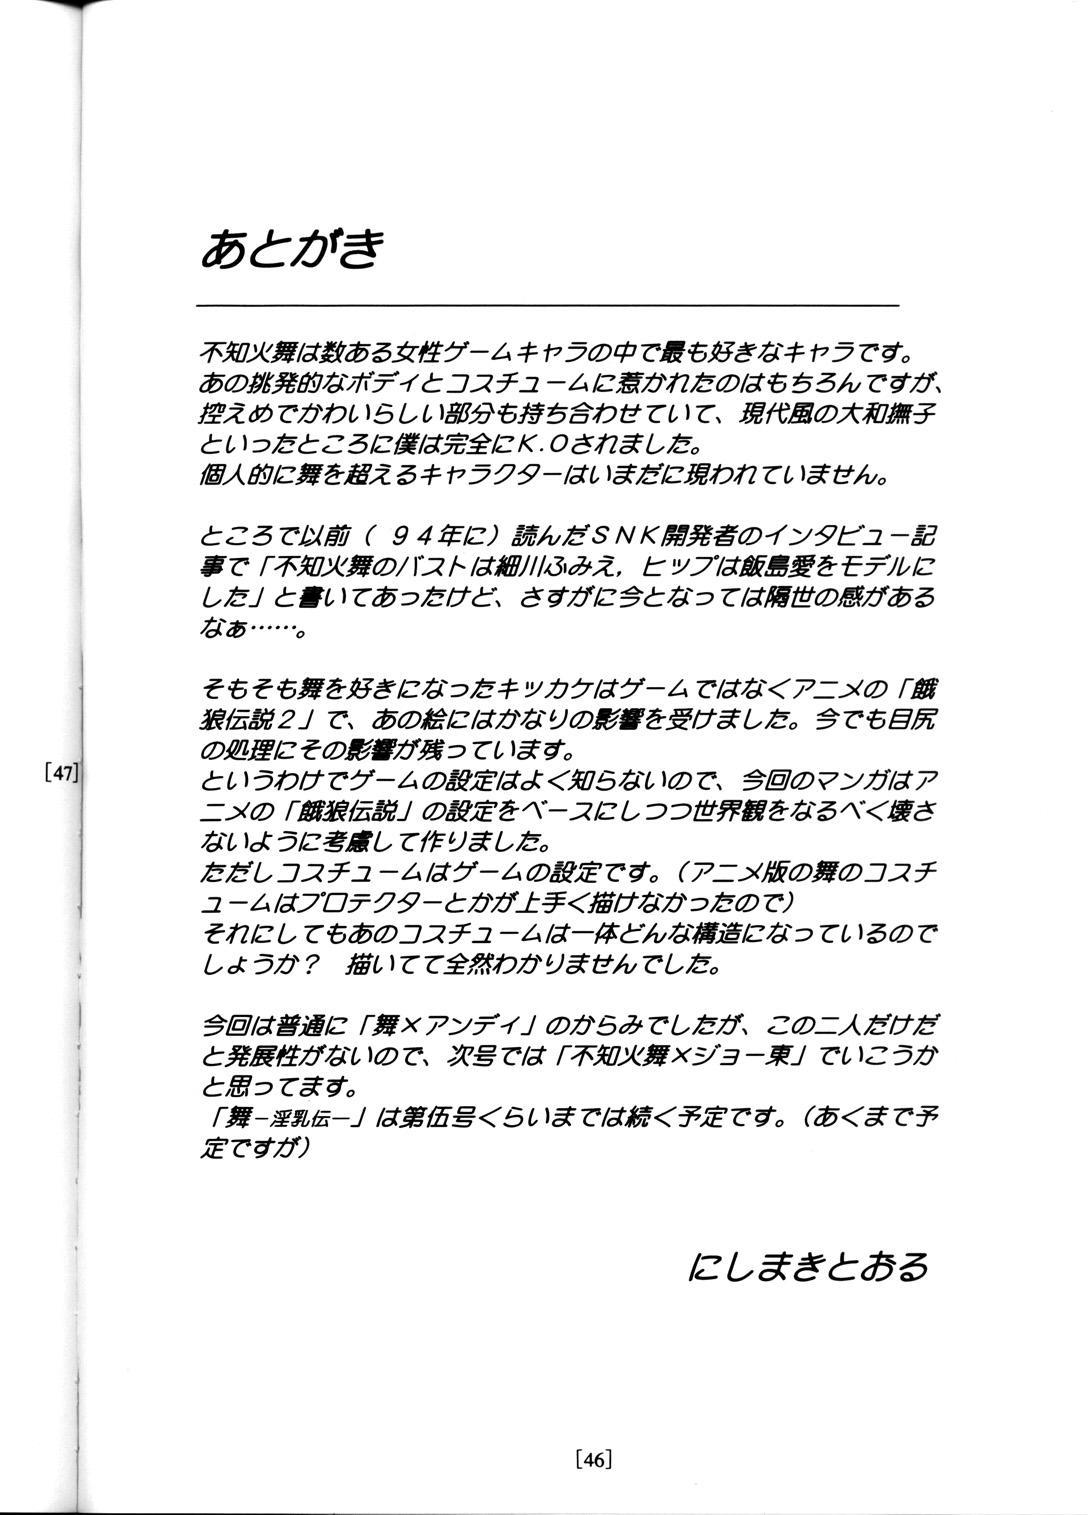 (C60) [D-LOVERS (Nishimaki Tohru)] Mai -Innyuuden- Daiichigou (King of Fighters) 44